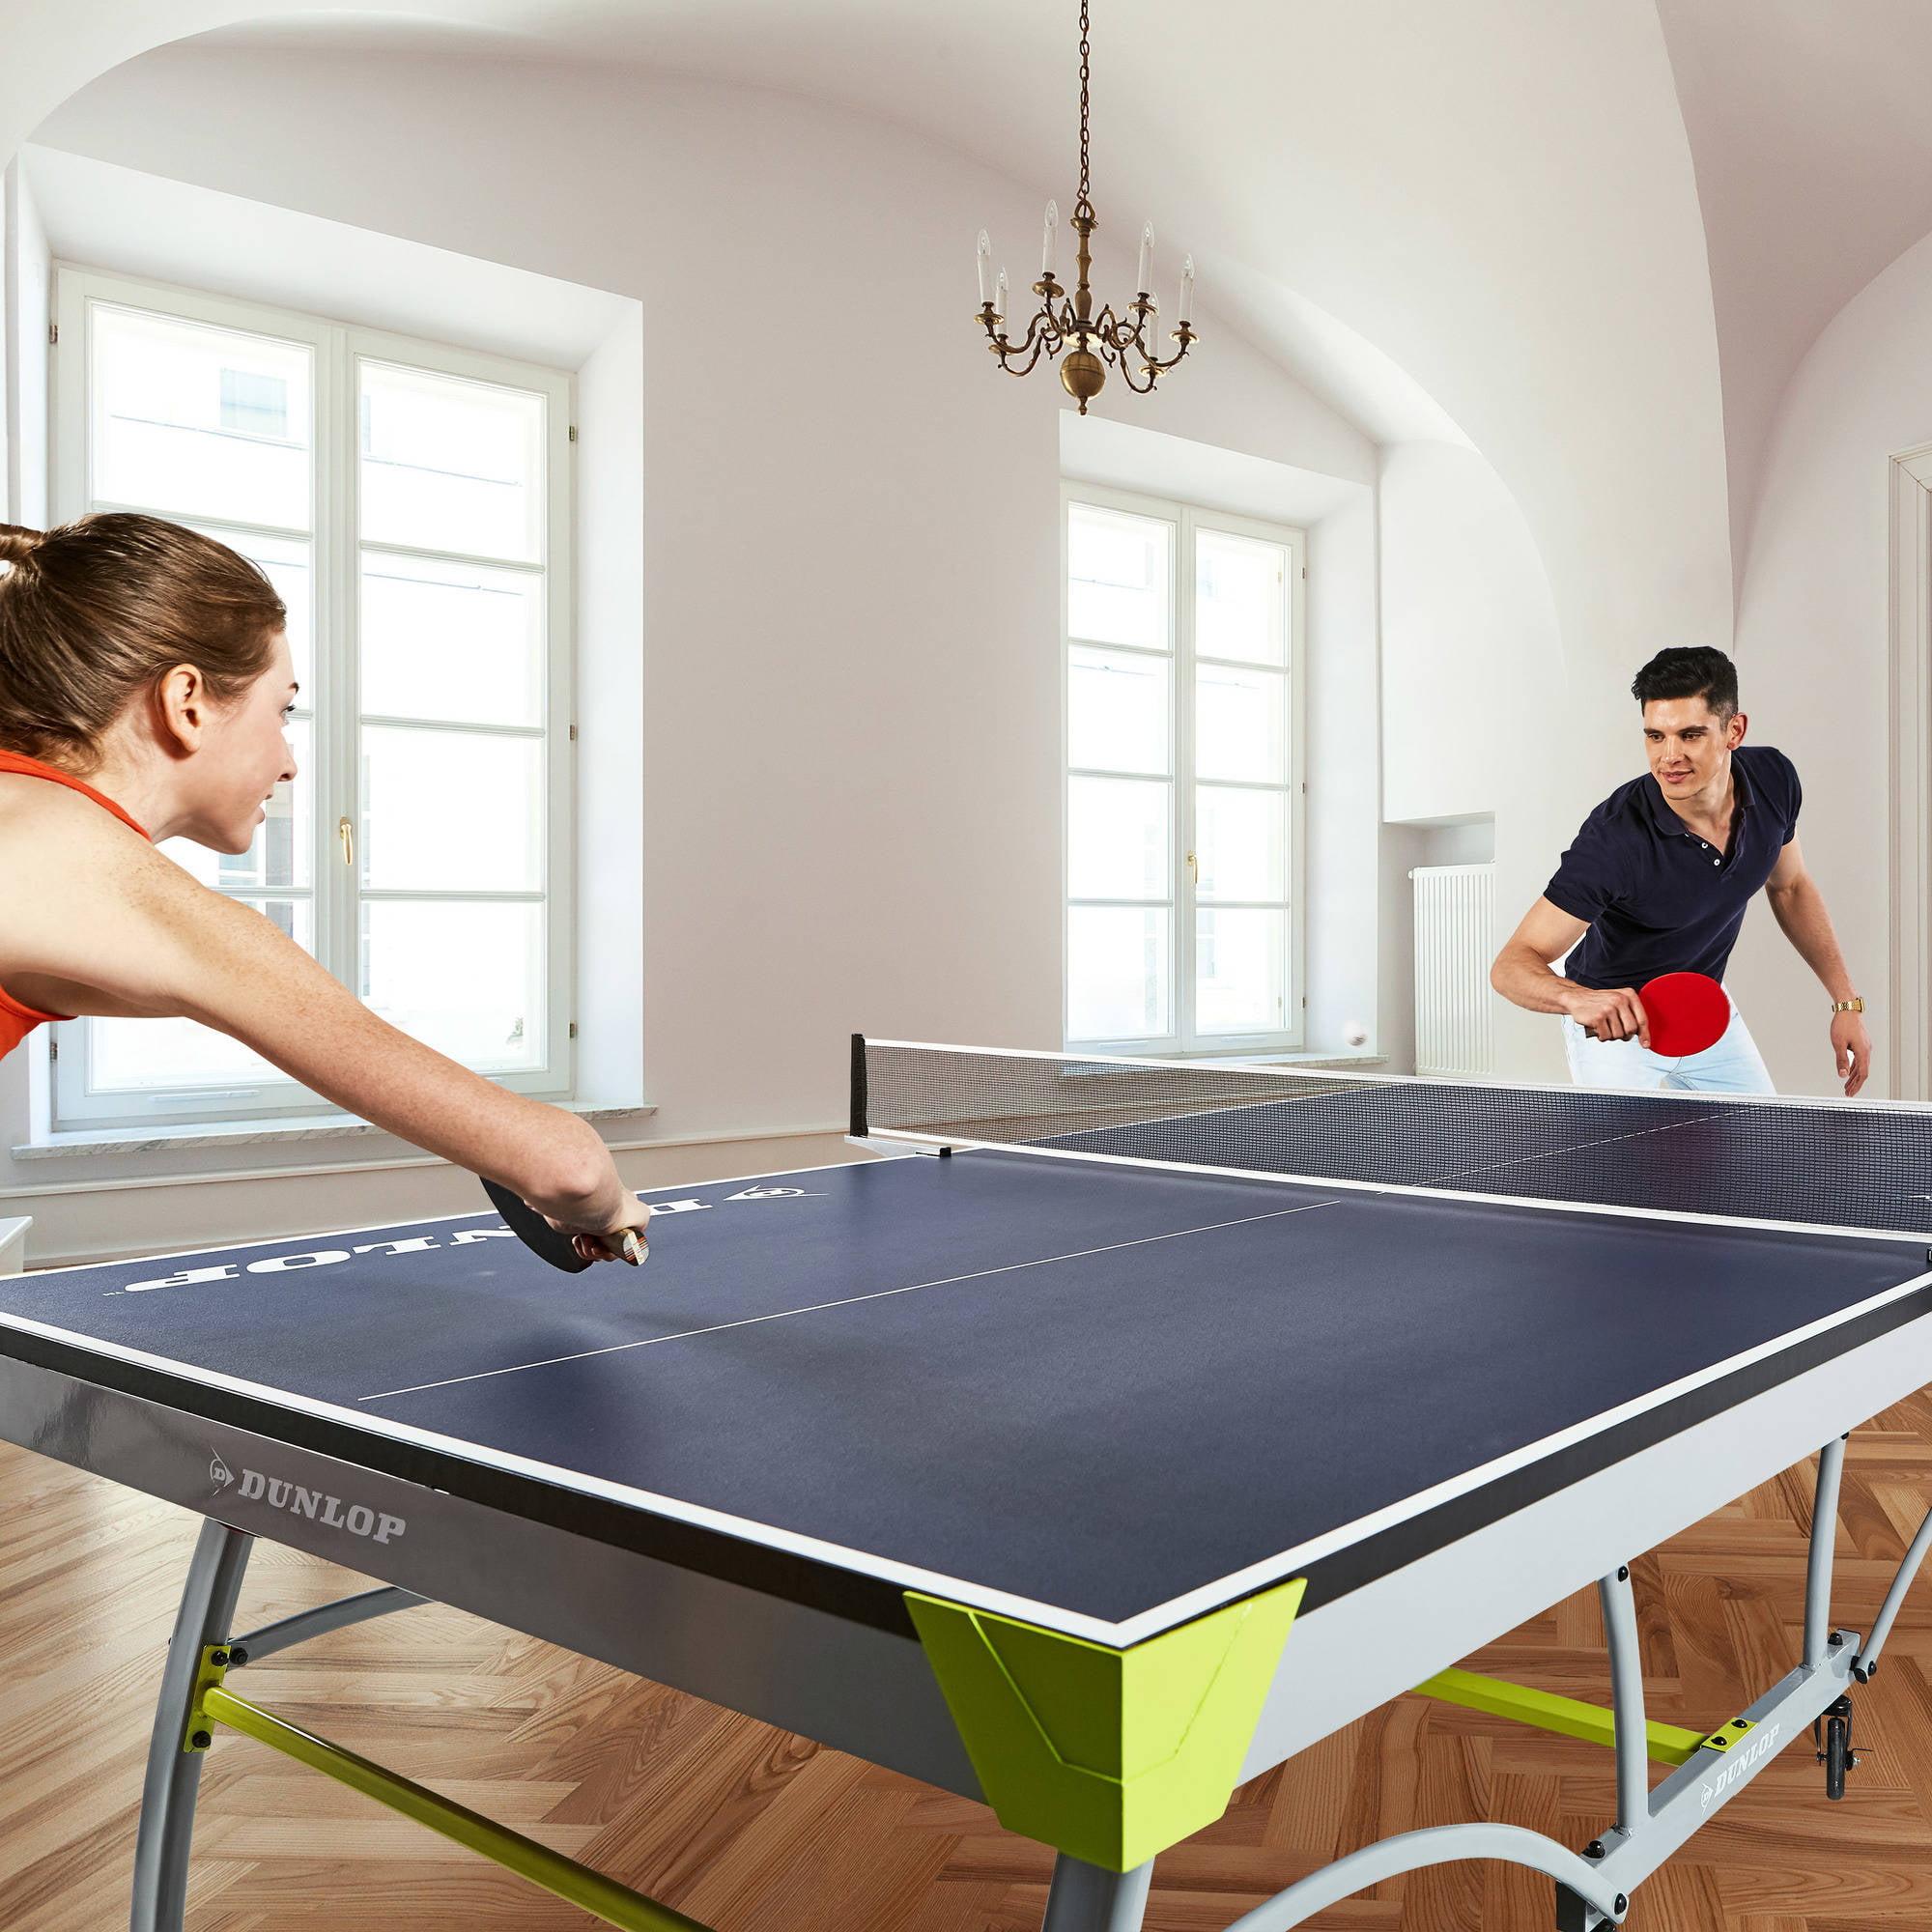 Dunlop Official Size Table Tennis Table   Walmart.com